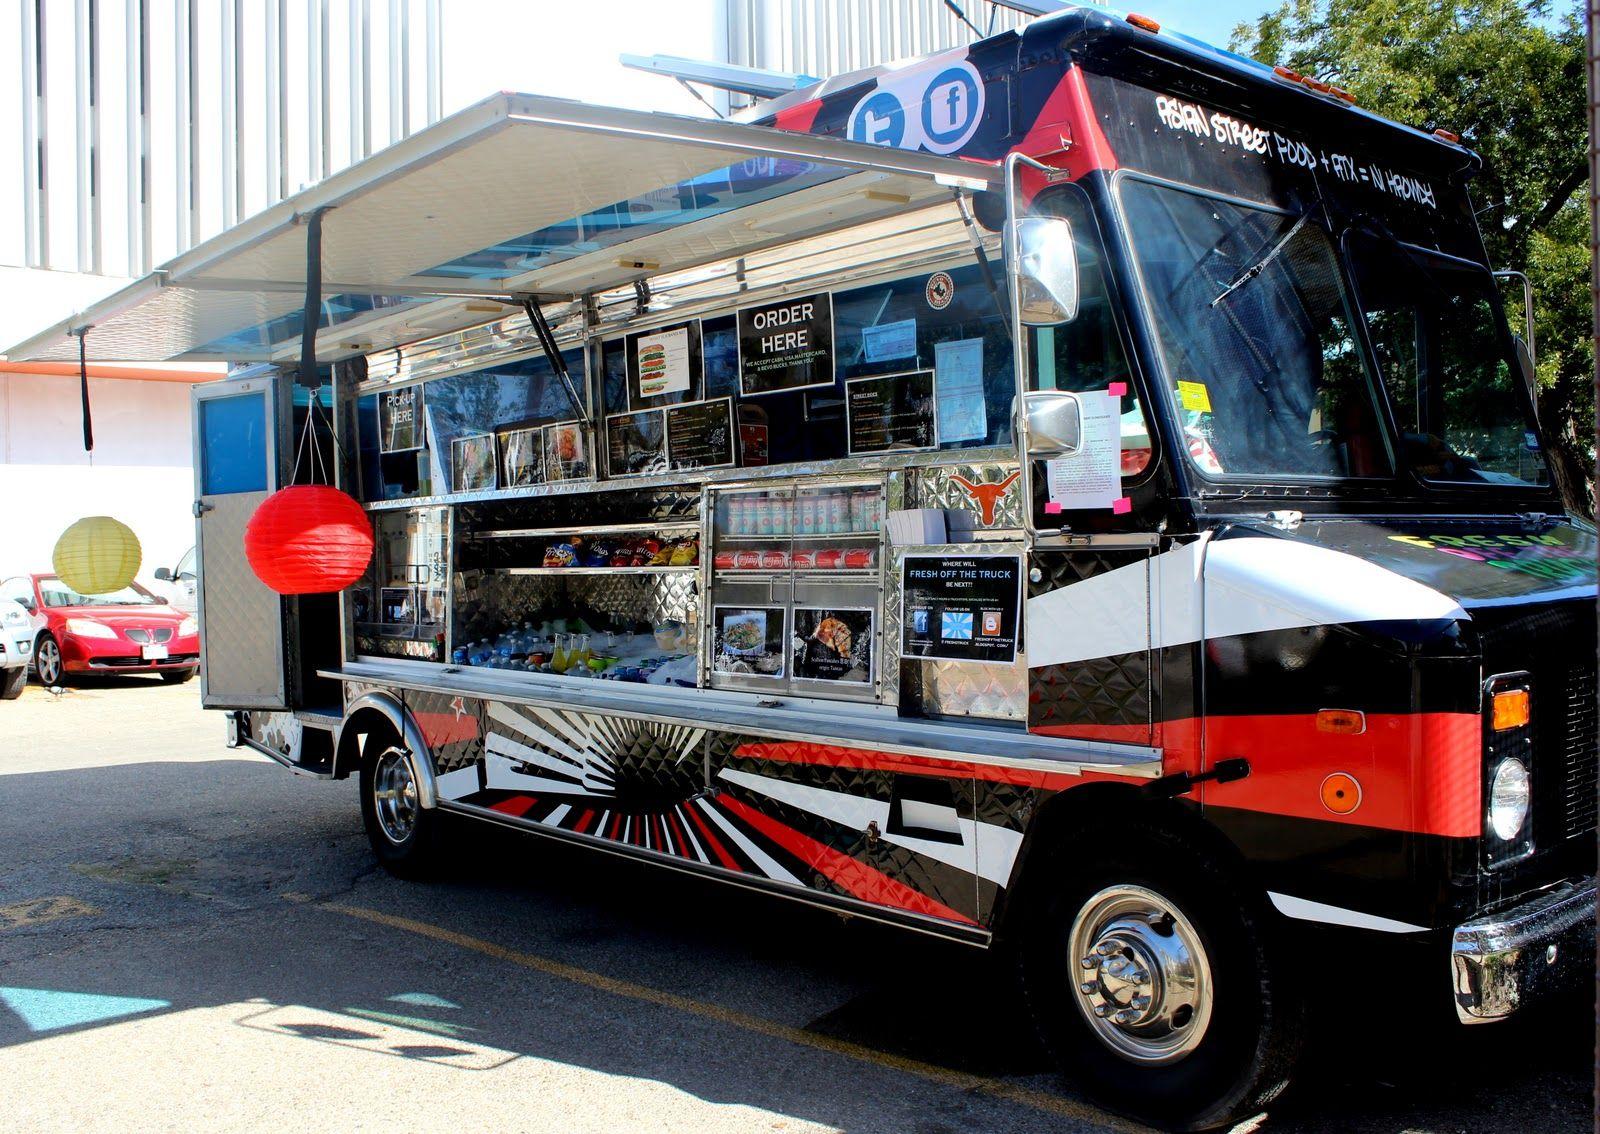 Street In Austin With Food Trucks